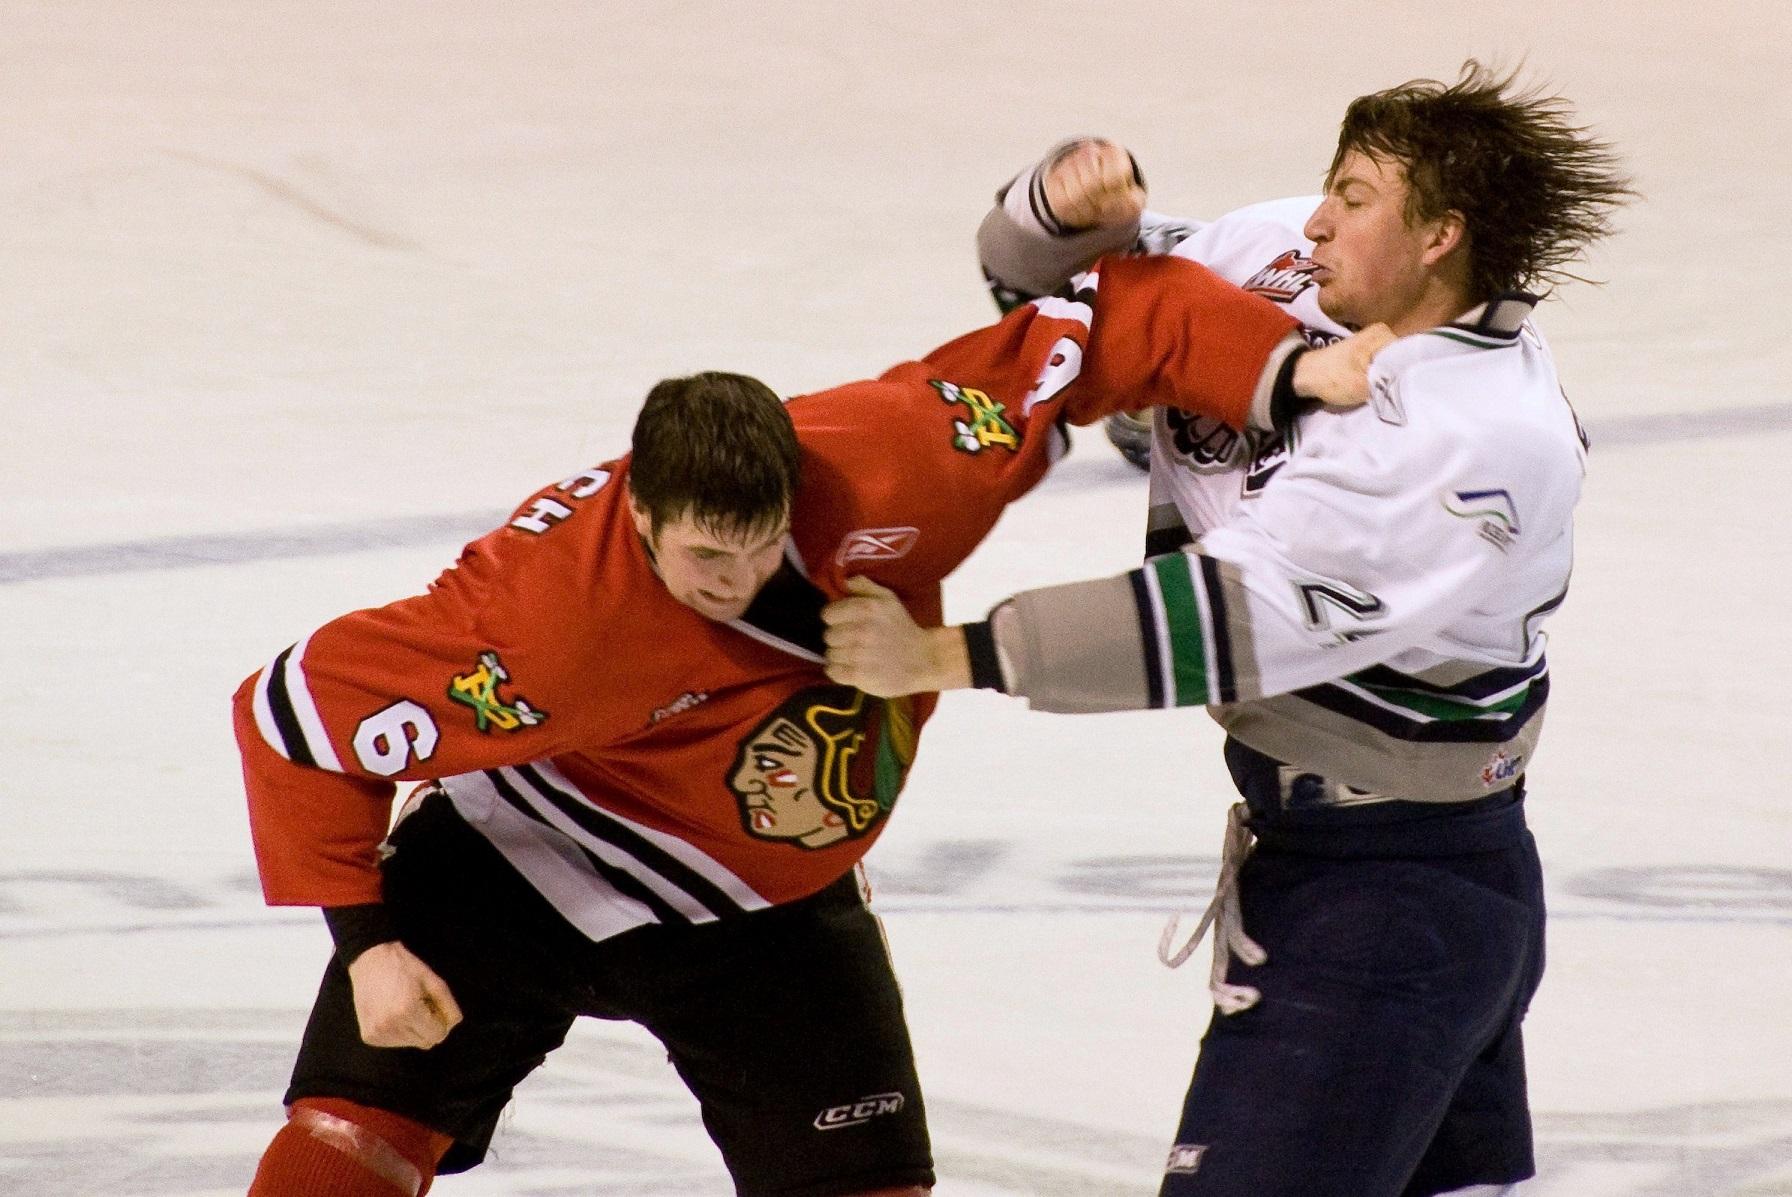 Fight_in_ice_hockey_2009